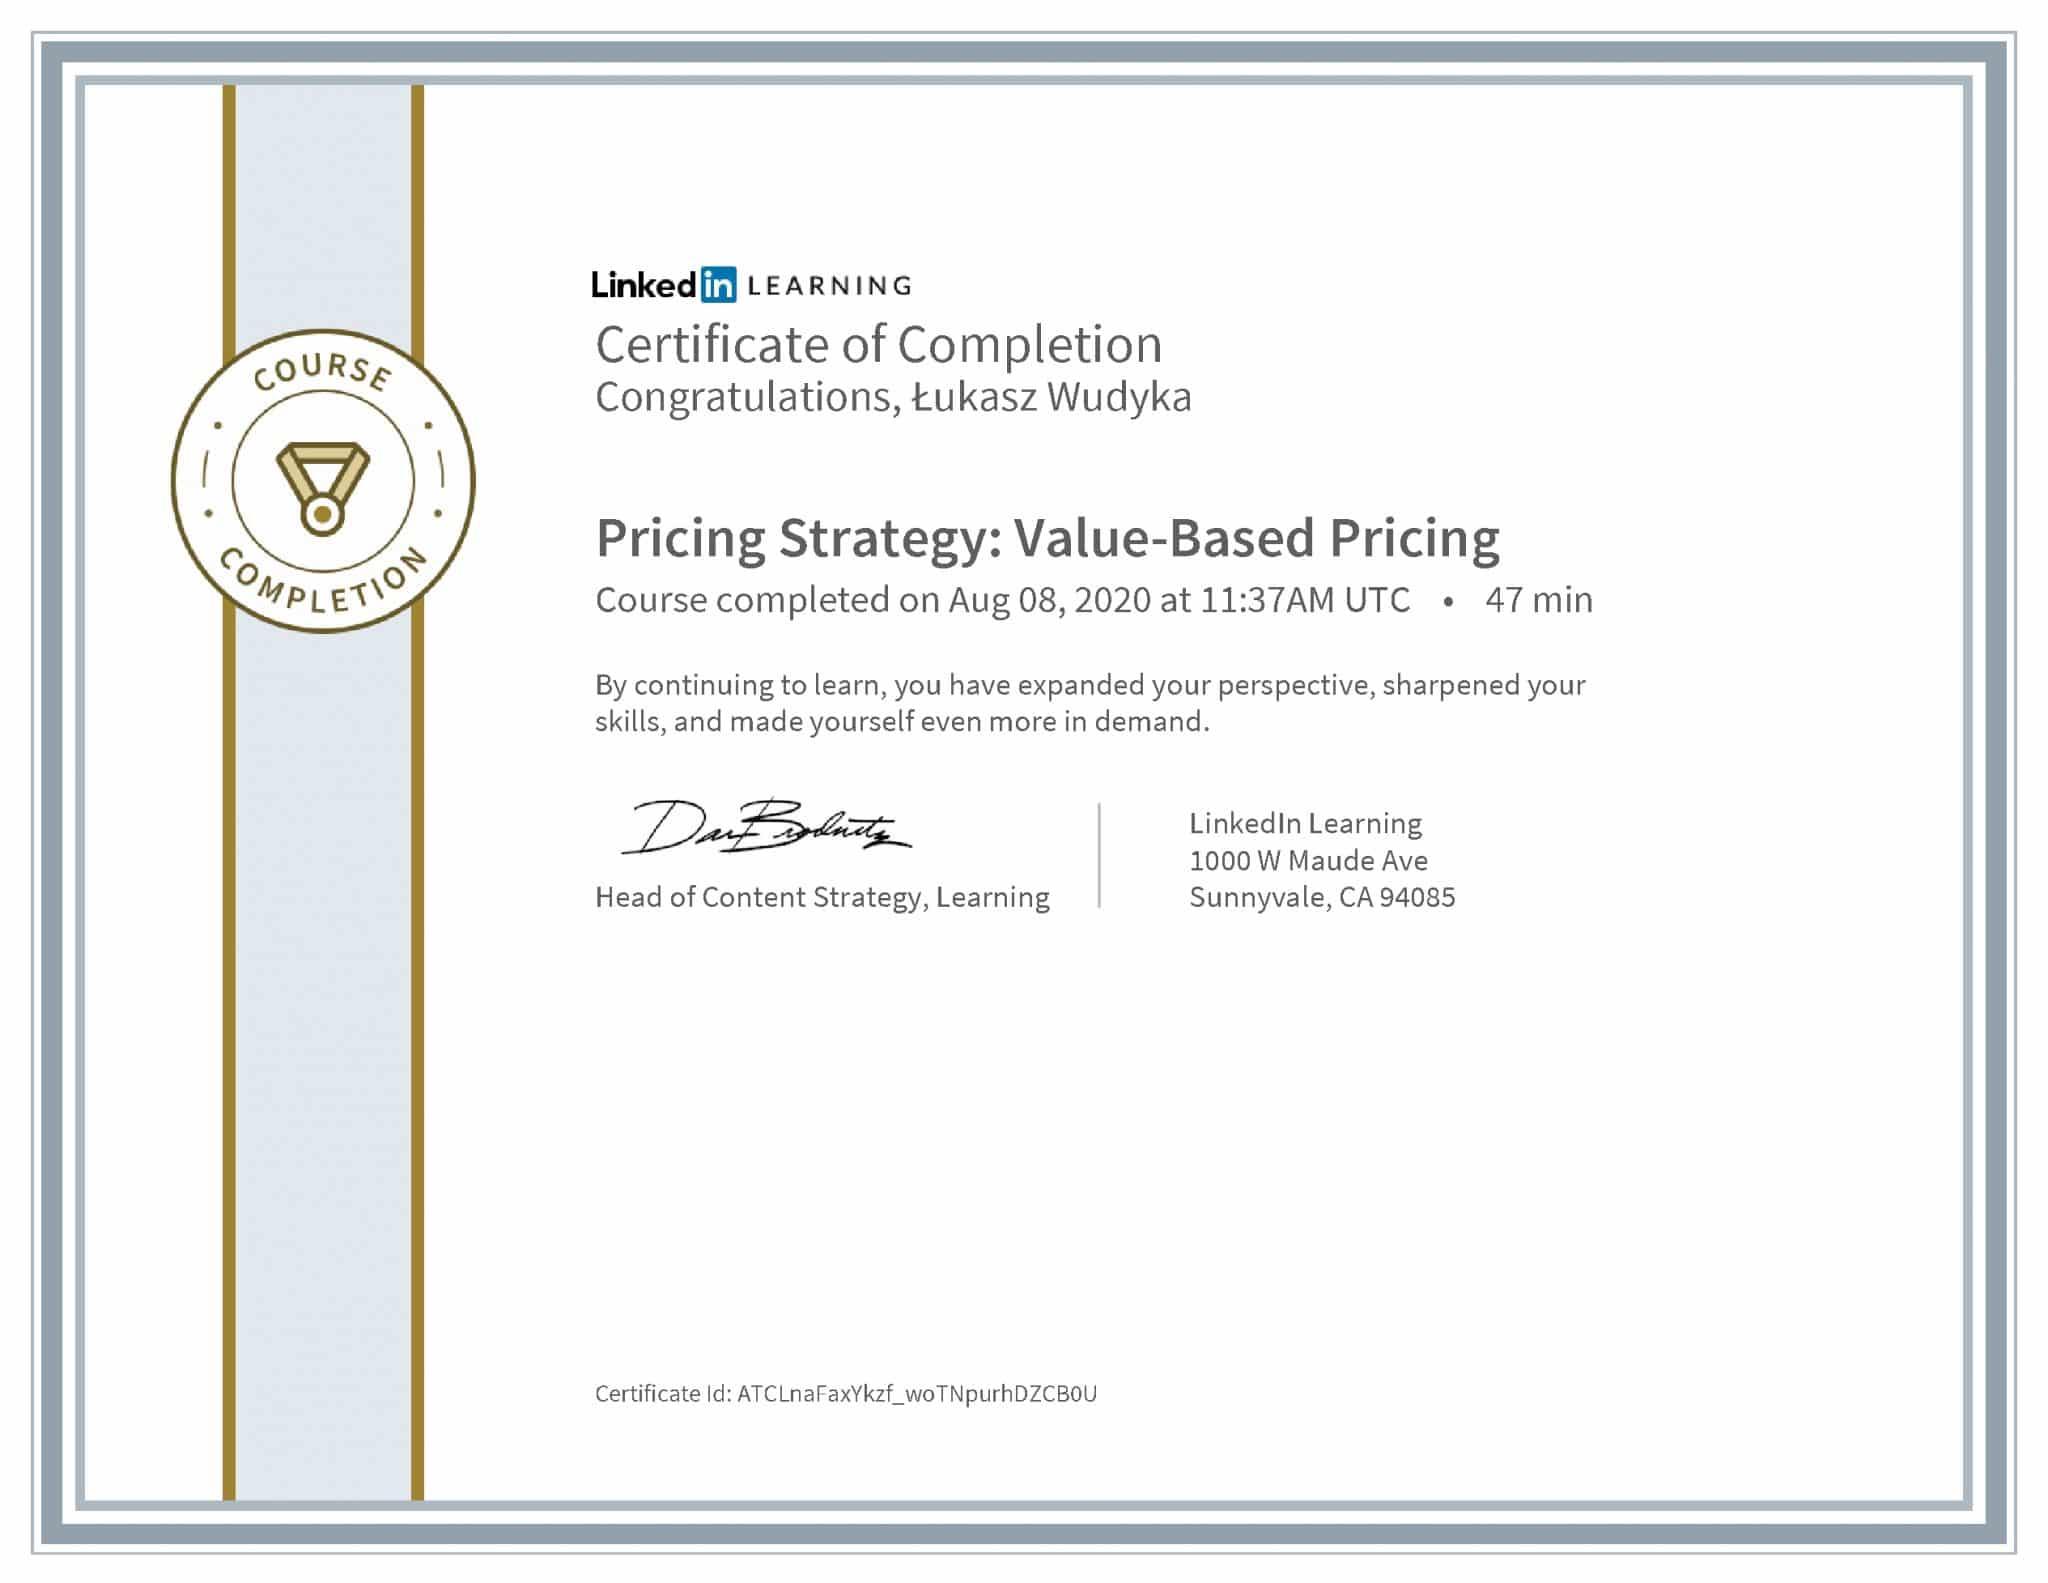 Łukasz Wudyka certyfikat LinkedIn Pricing Strategy: Value-Based Pricing